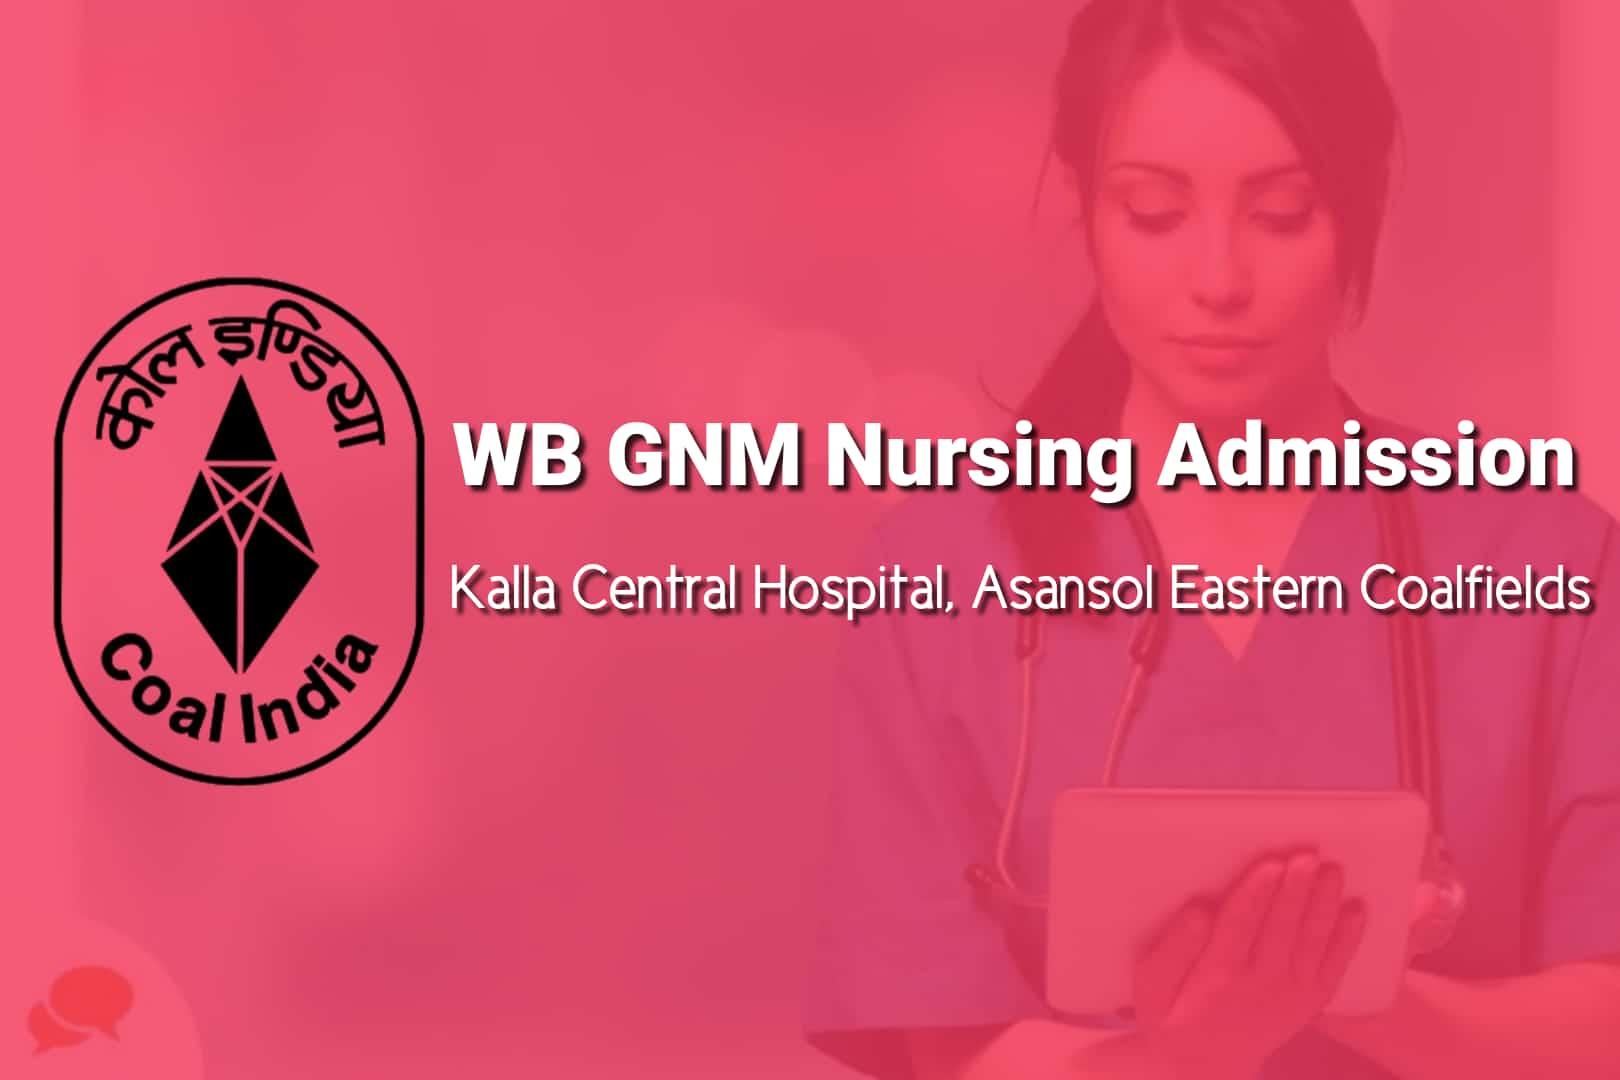 WB GNM Admission 2021 Kalla Central Hospital Asansol Eastern Coalfields 1